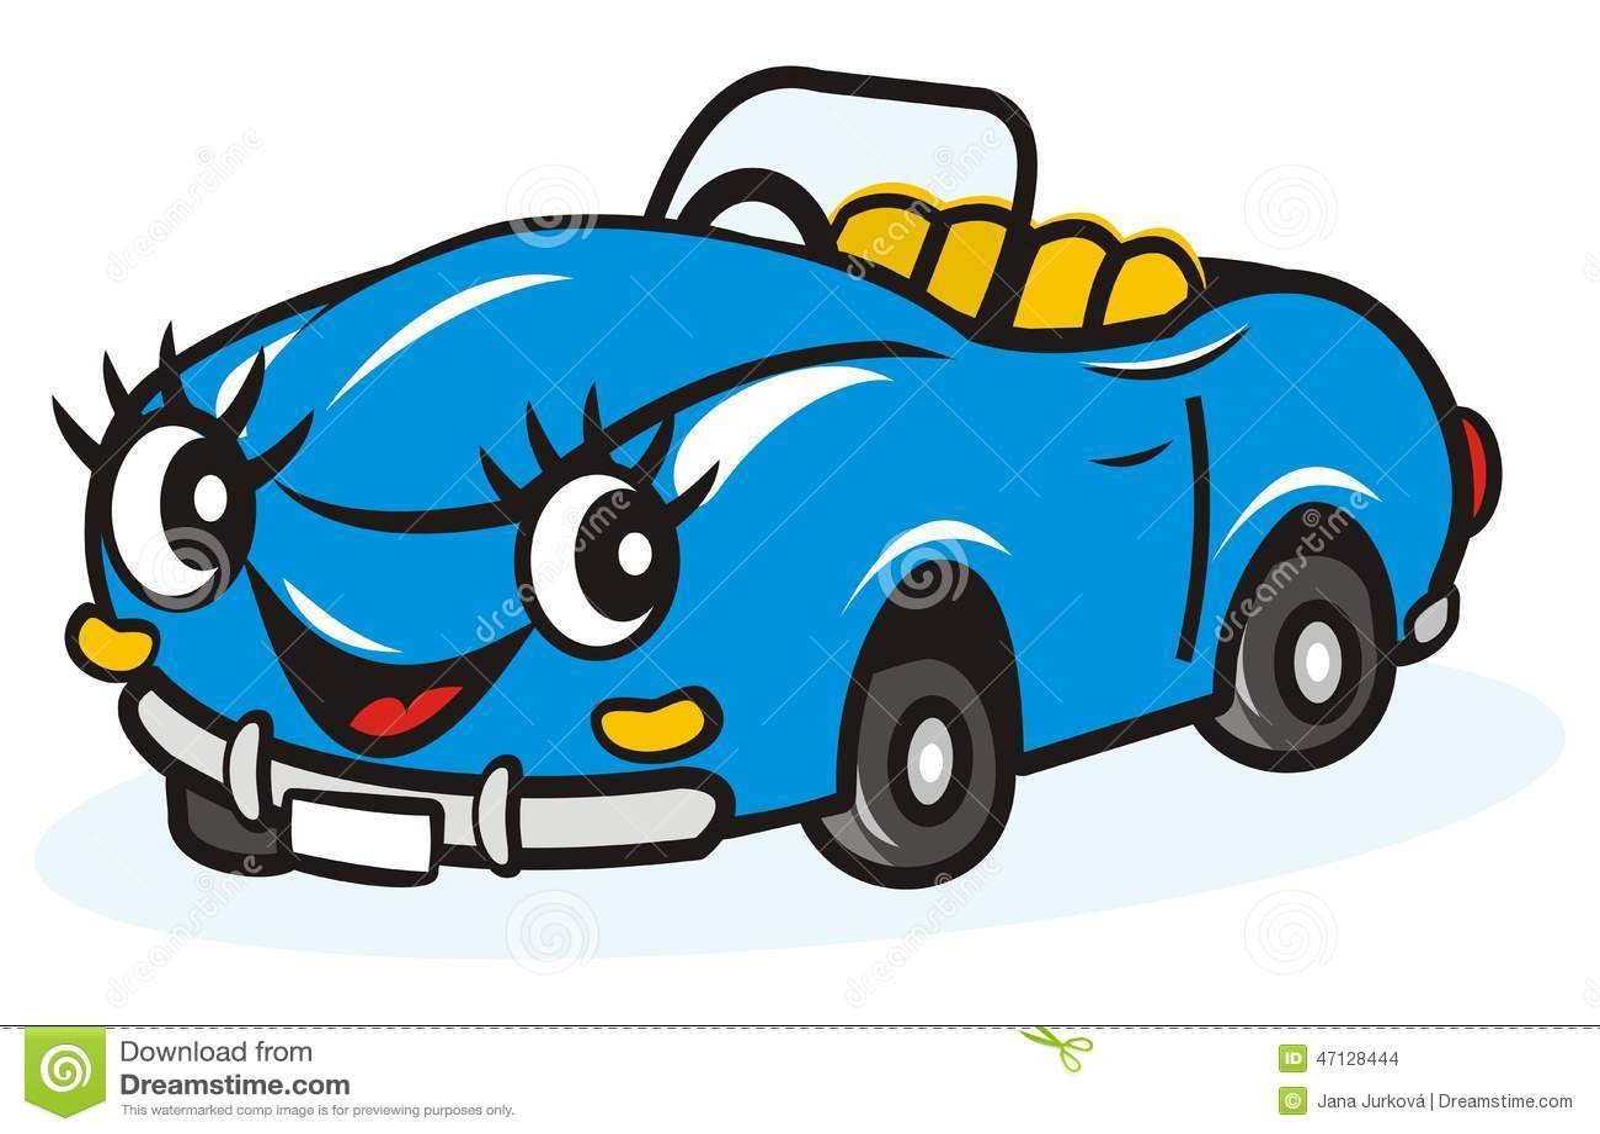 vehicle diagram clip art apexi turbo timer wiring subaru blue car stock vector image 47128444